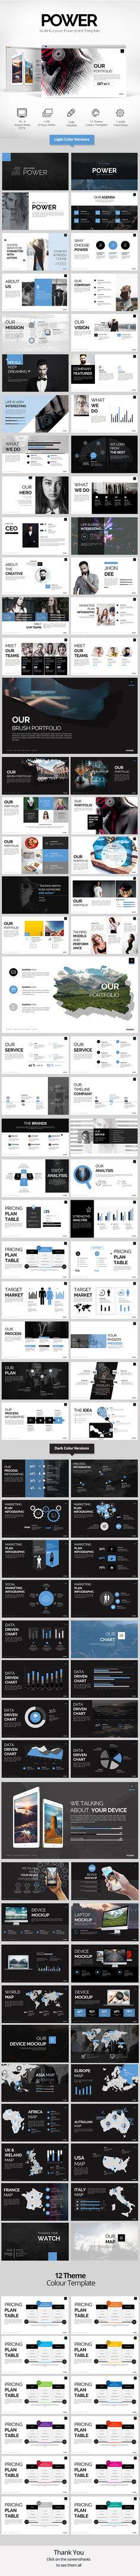 Power Powerpoint Presentation Template. Download here: http://graphicriver.net/item/power-powerpoint-presentation/16827903?ref=ksioks